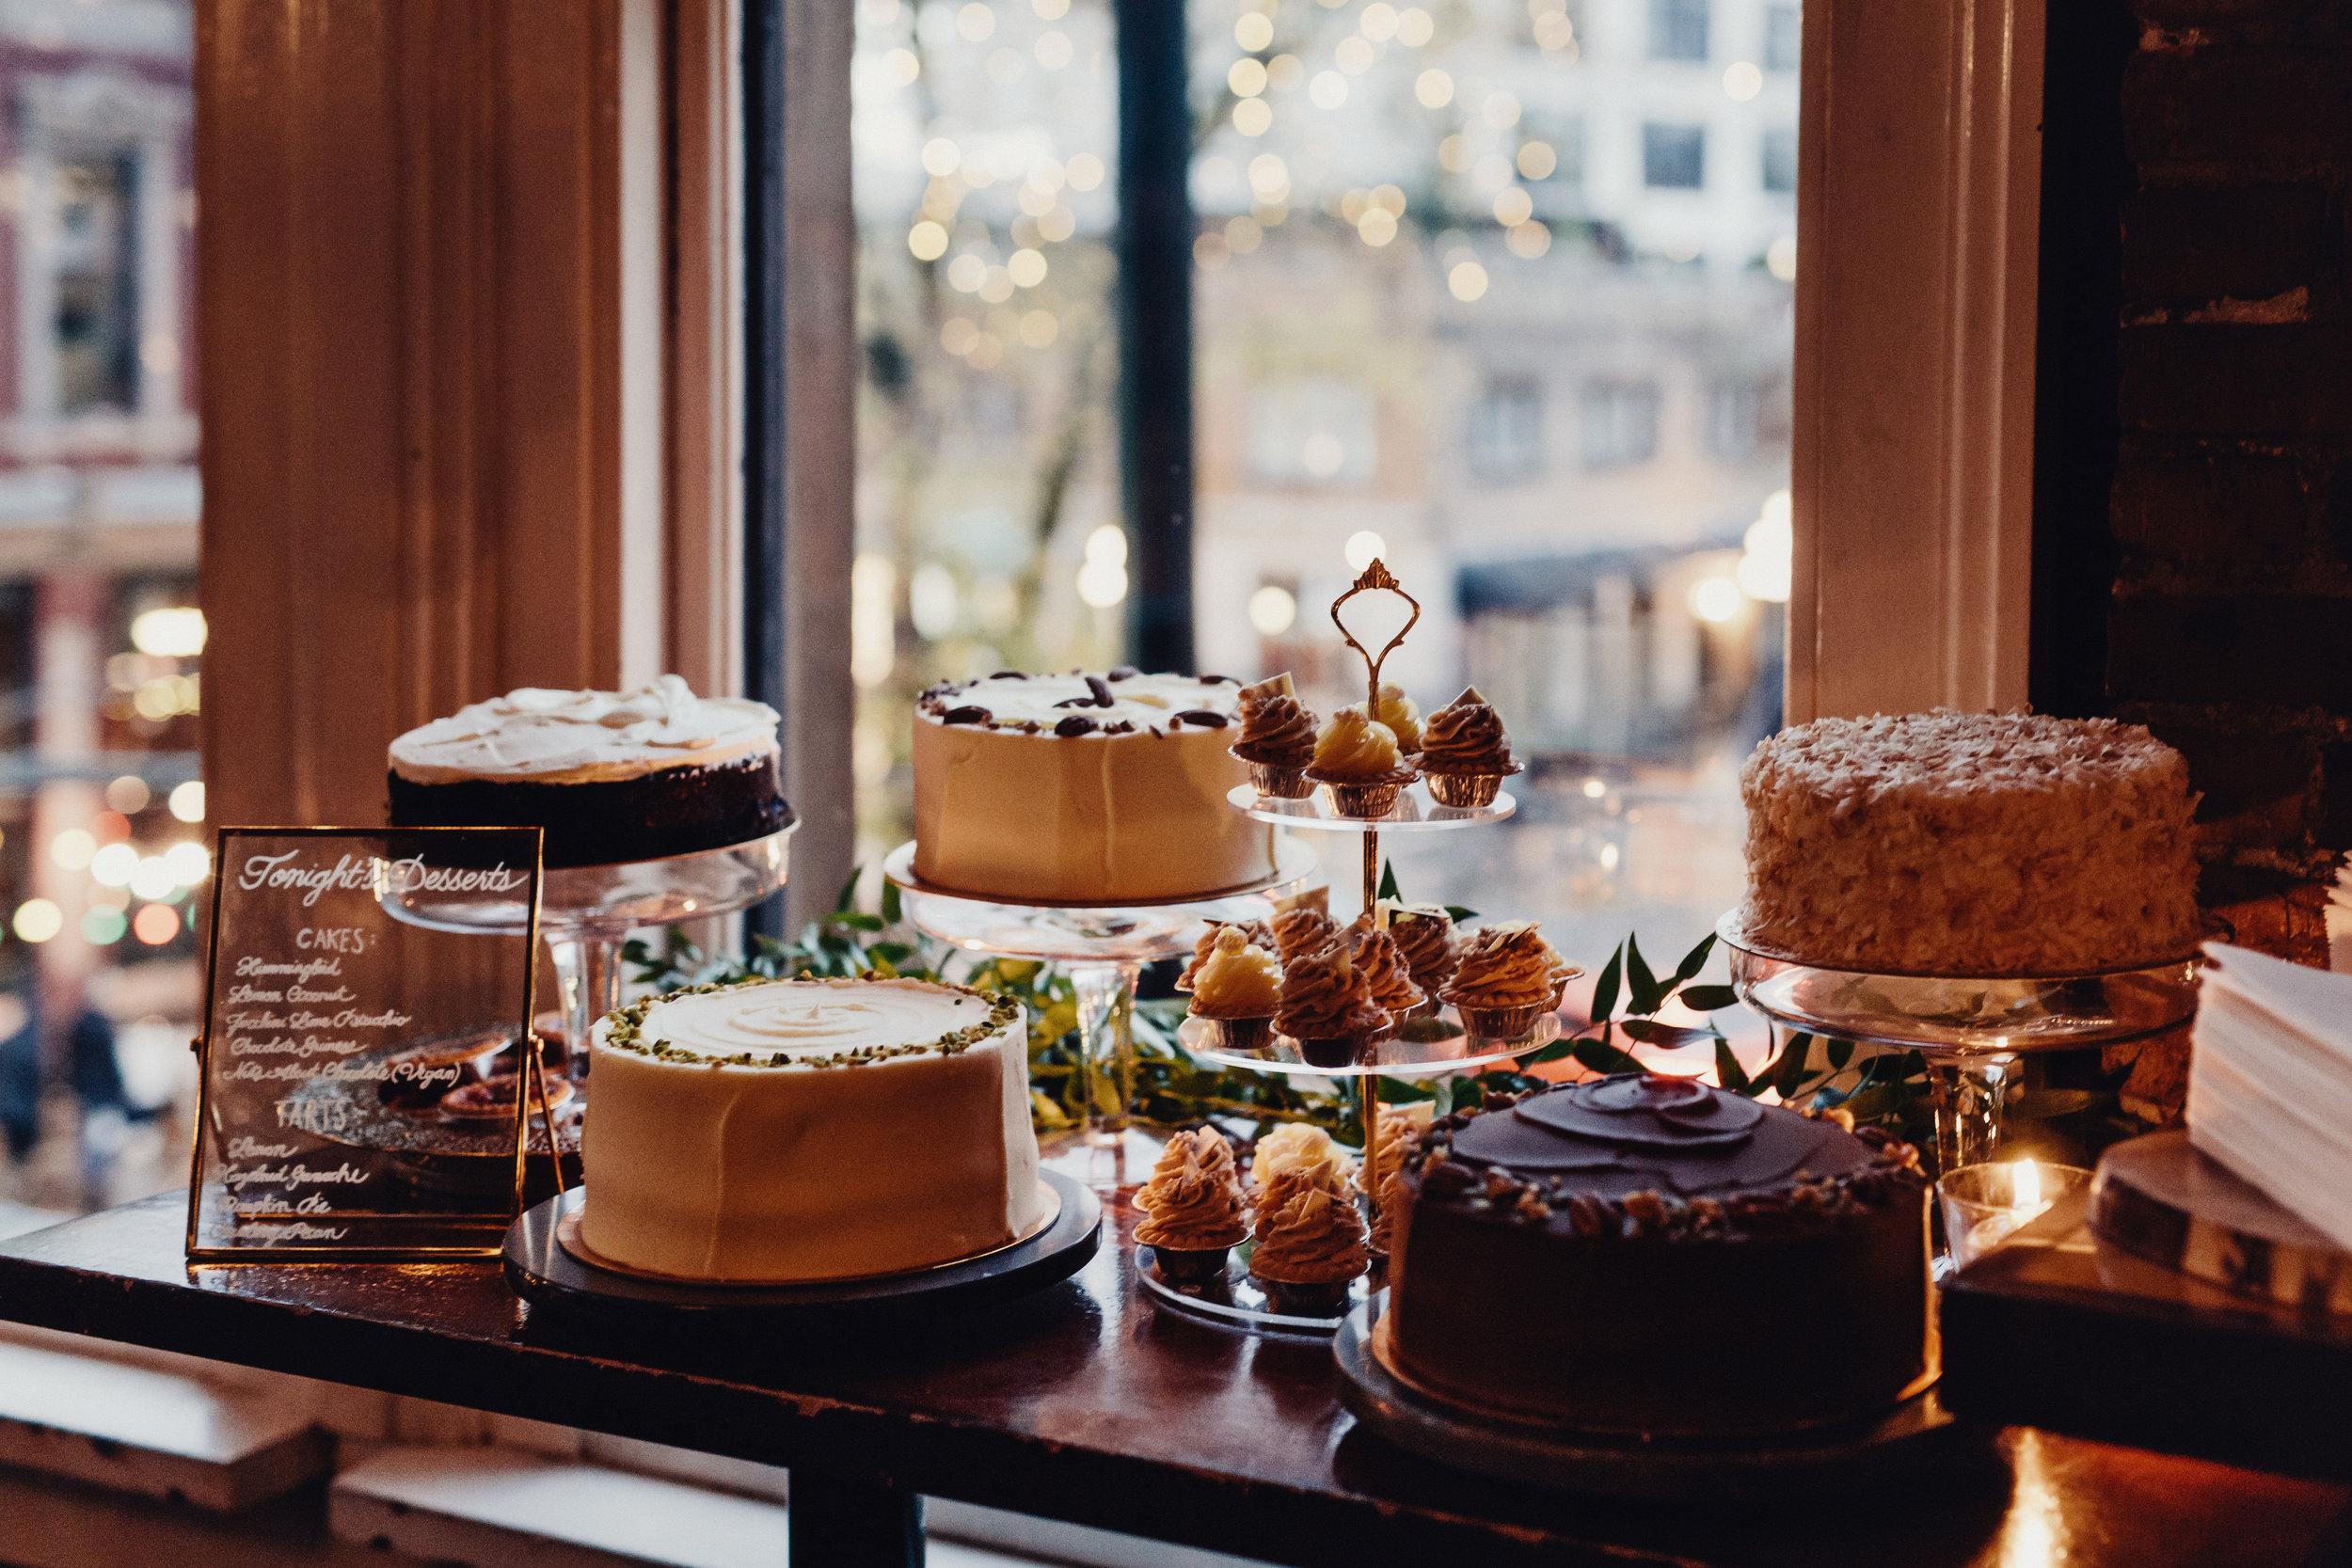 wedding cakes at the diamond restaurant vancouver british columbia